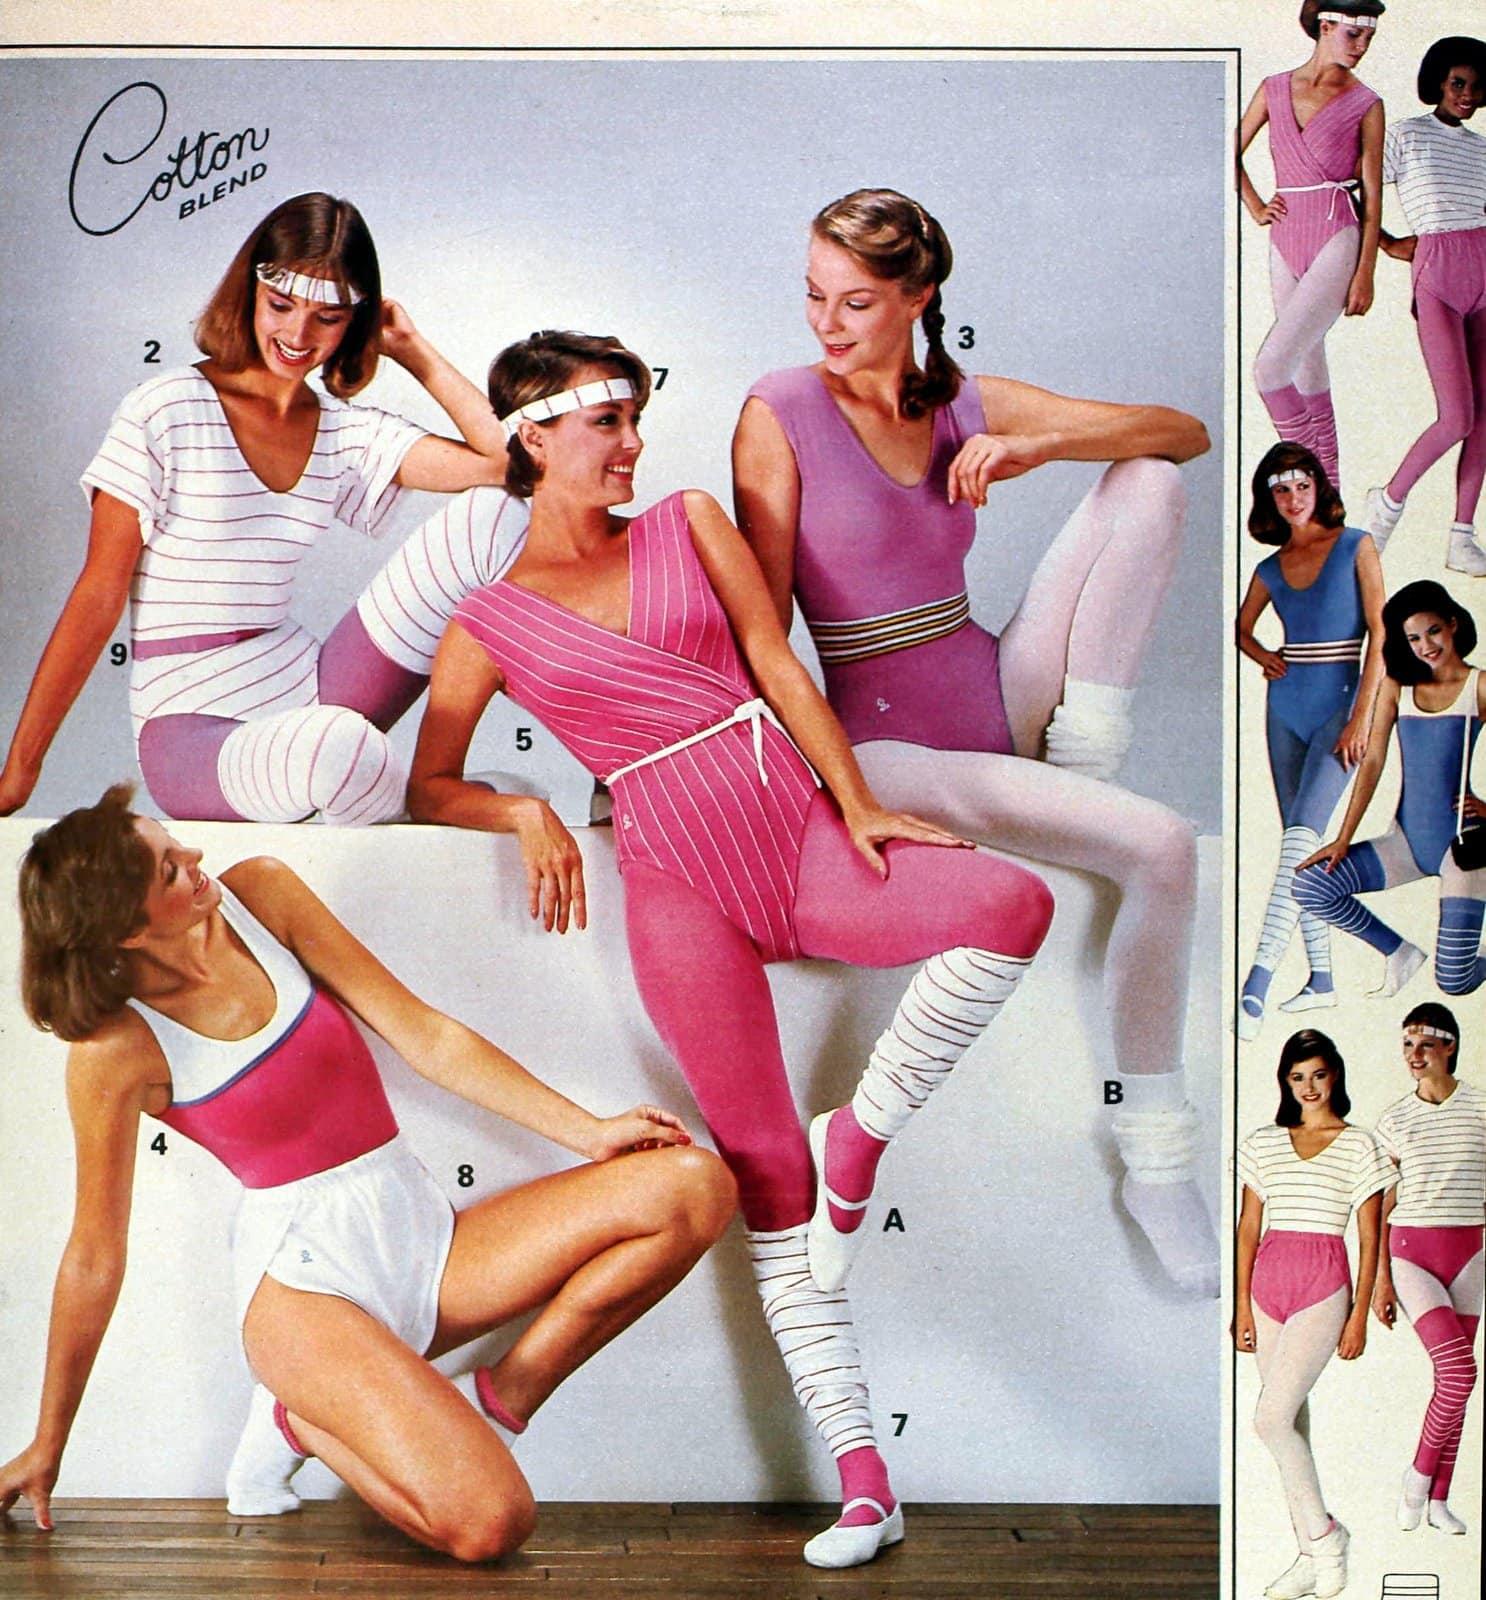 Peppy preppy pastel workout gear with leg warmers (1980s)